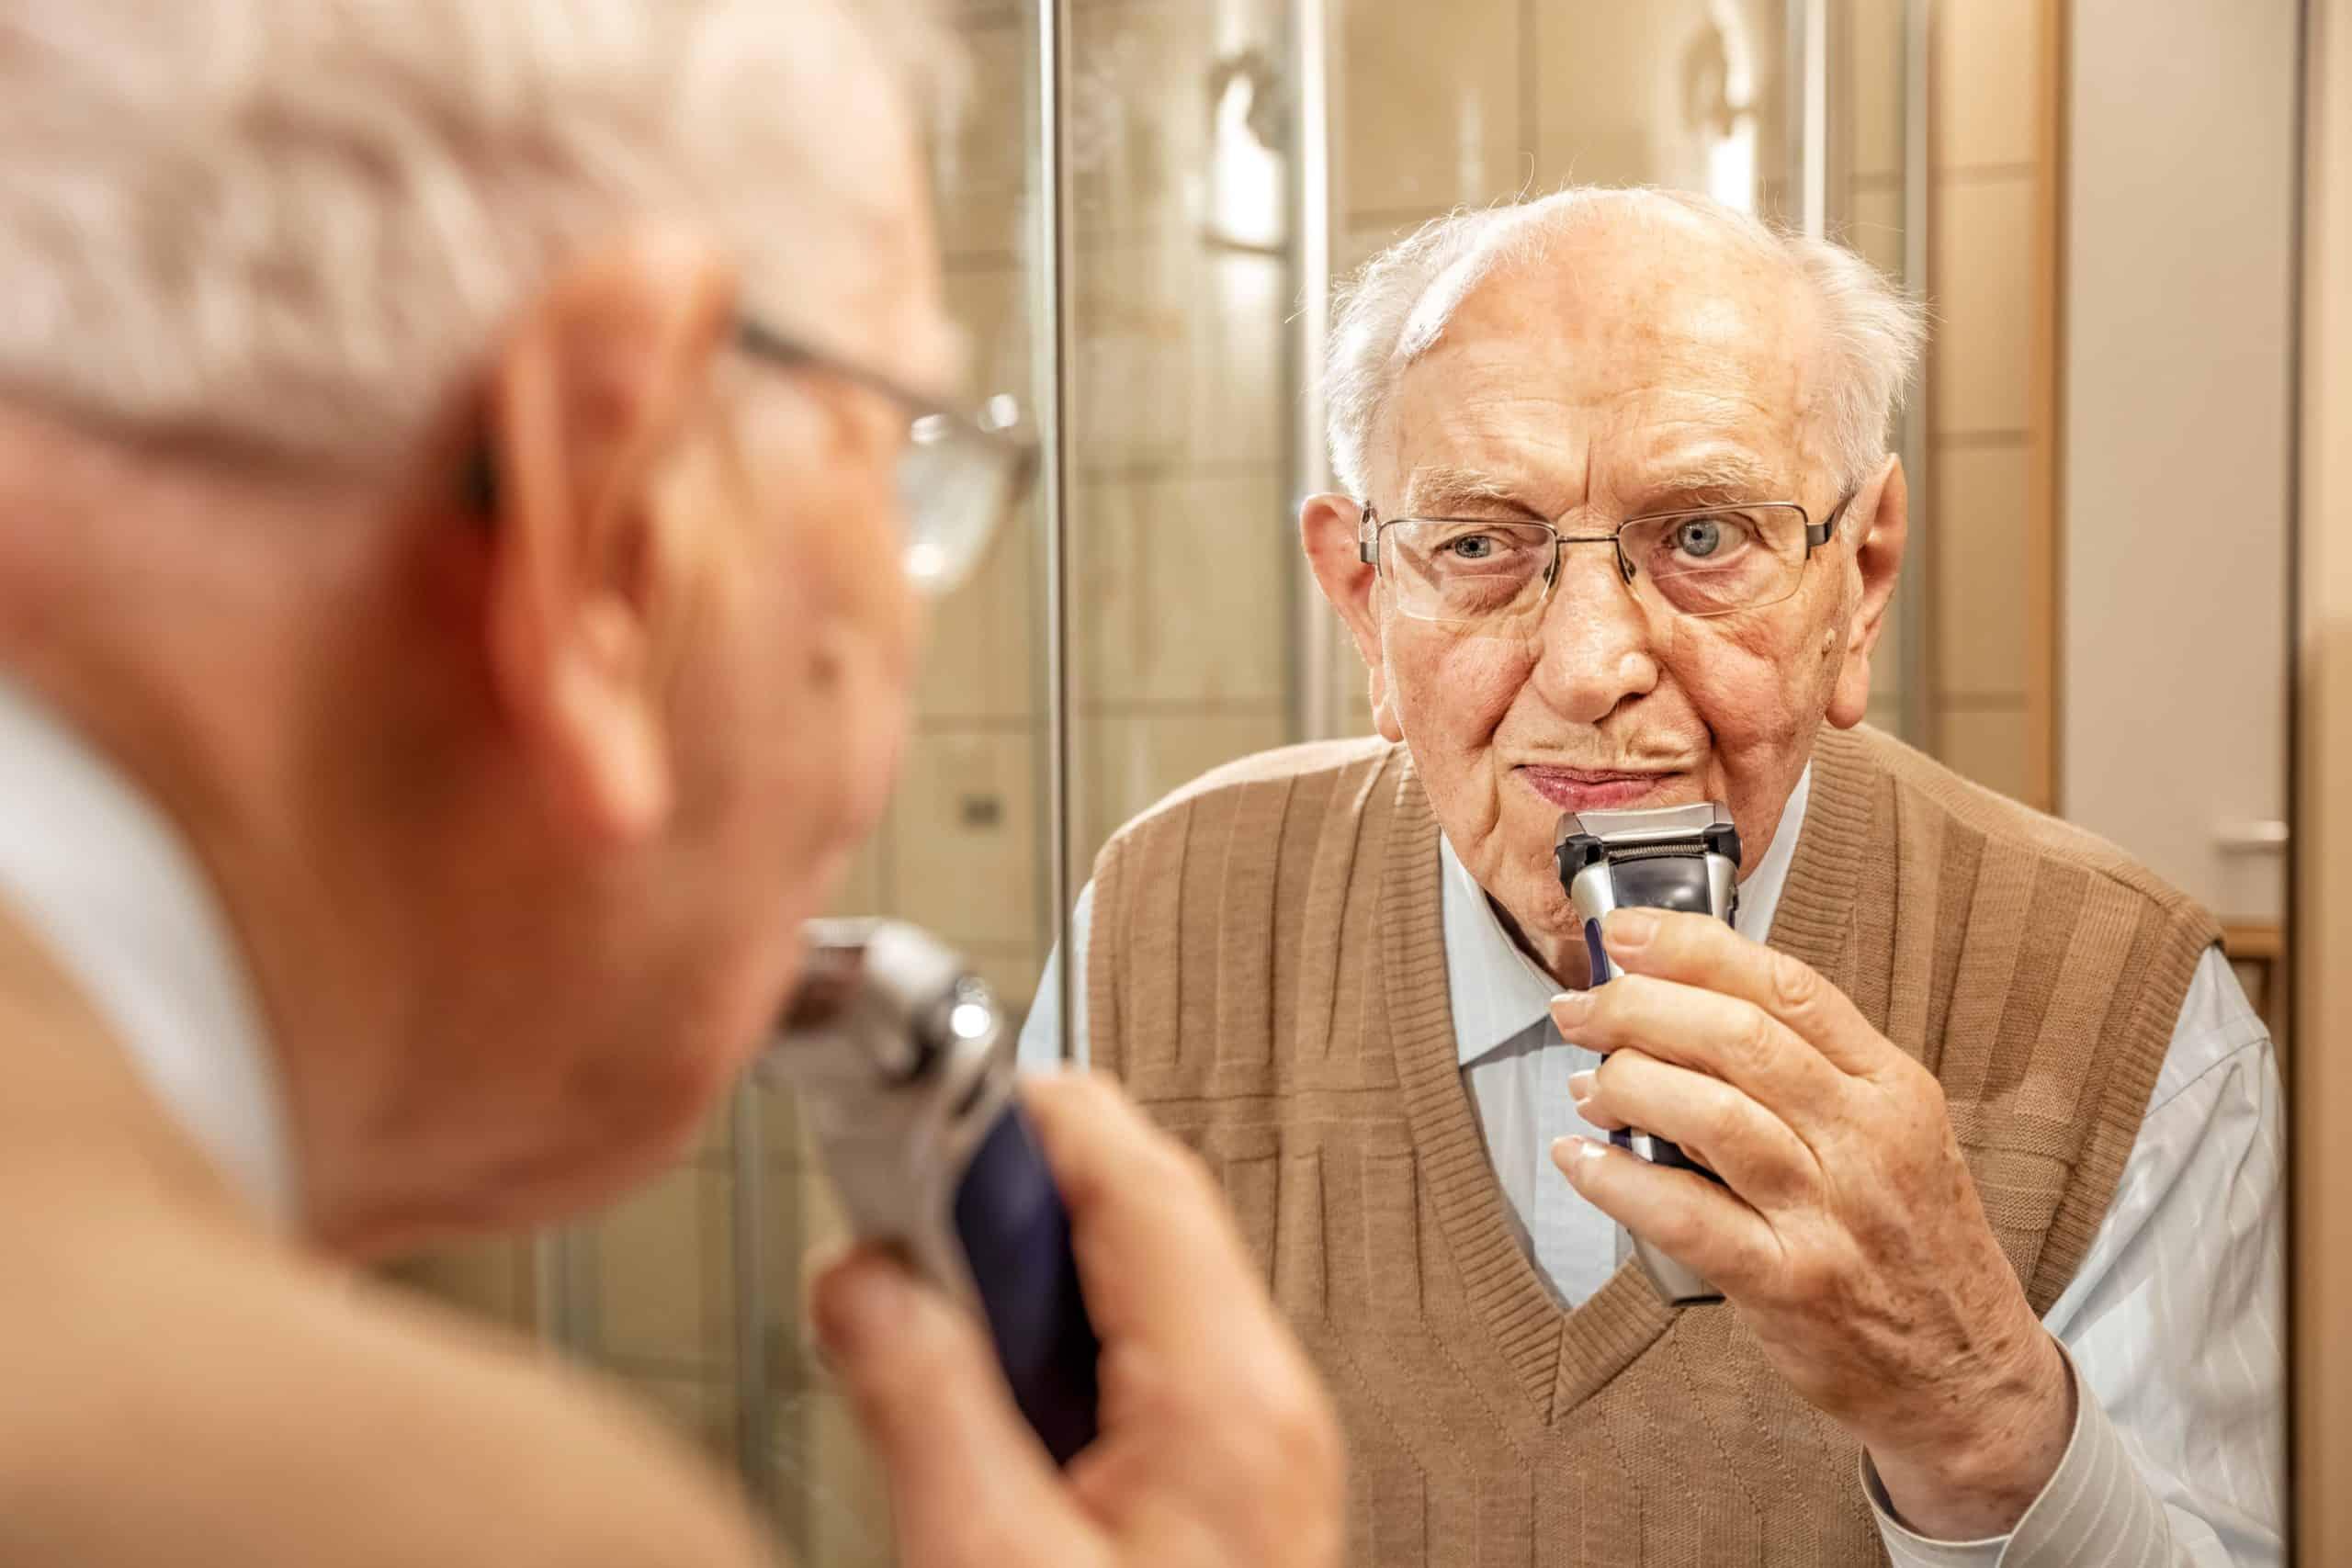 Elderly Person in the Bathroom, Shaving